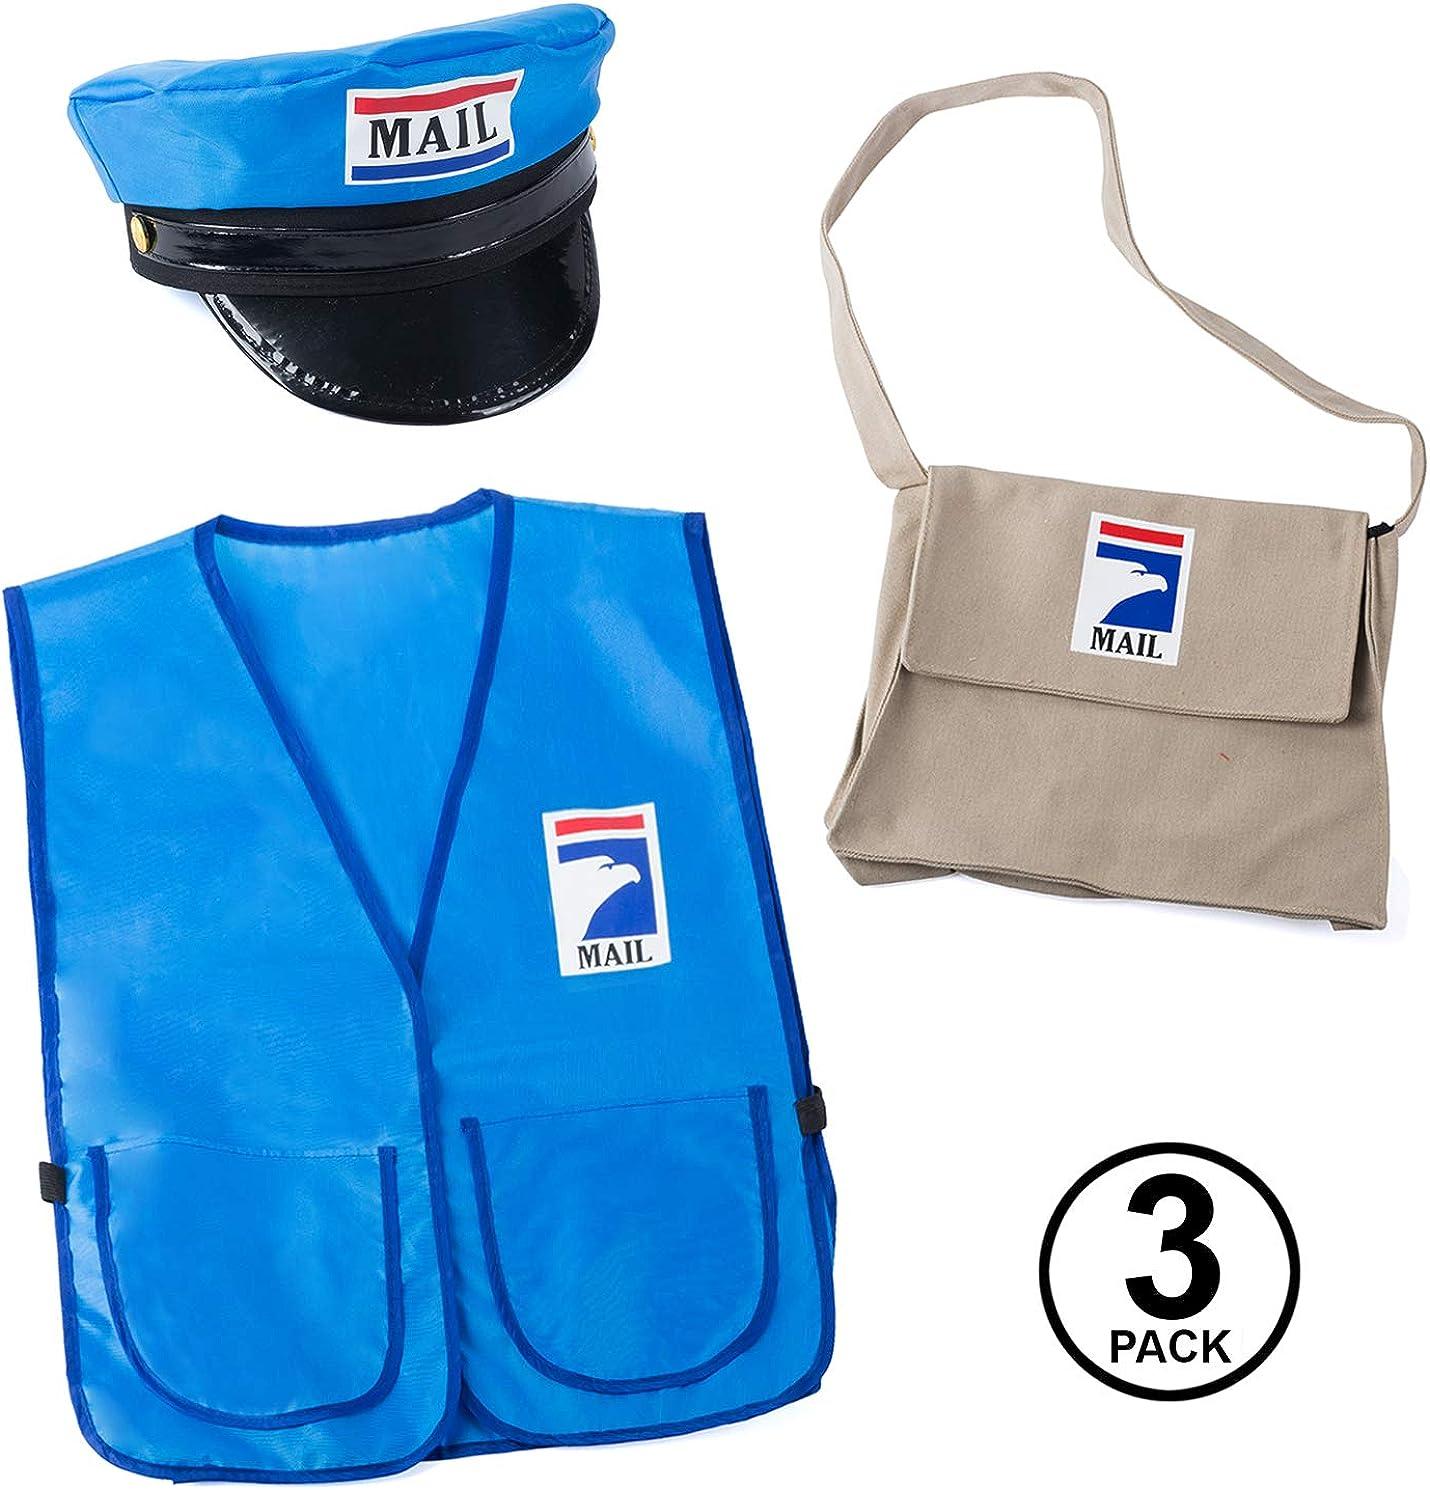 Mr Dress Up Tigerdoe Mailman Costume for Kids Postman Costume Carreer Day Occupational Costume